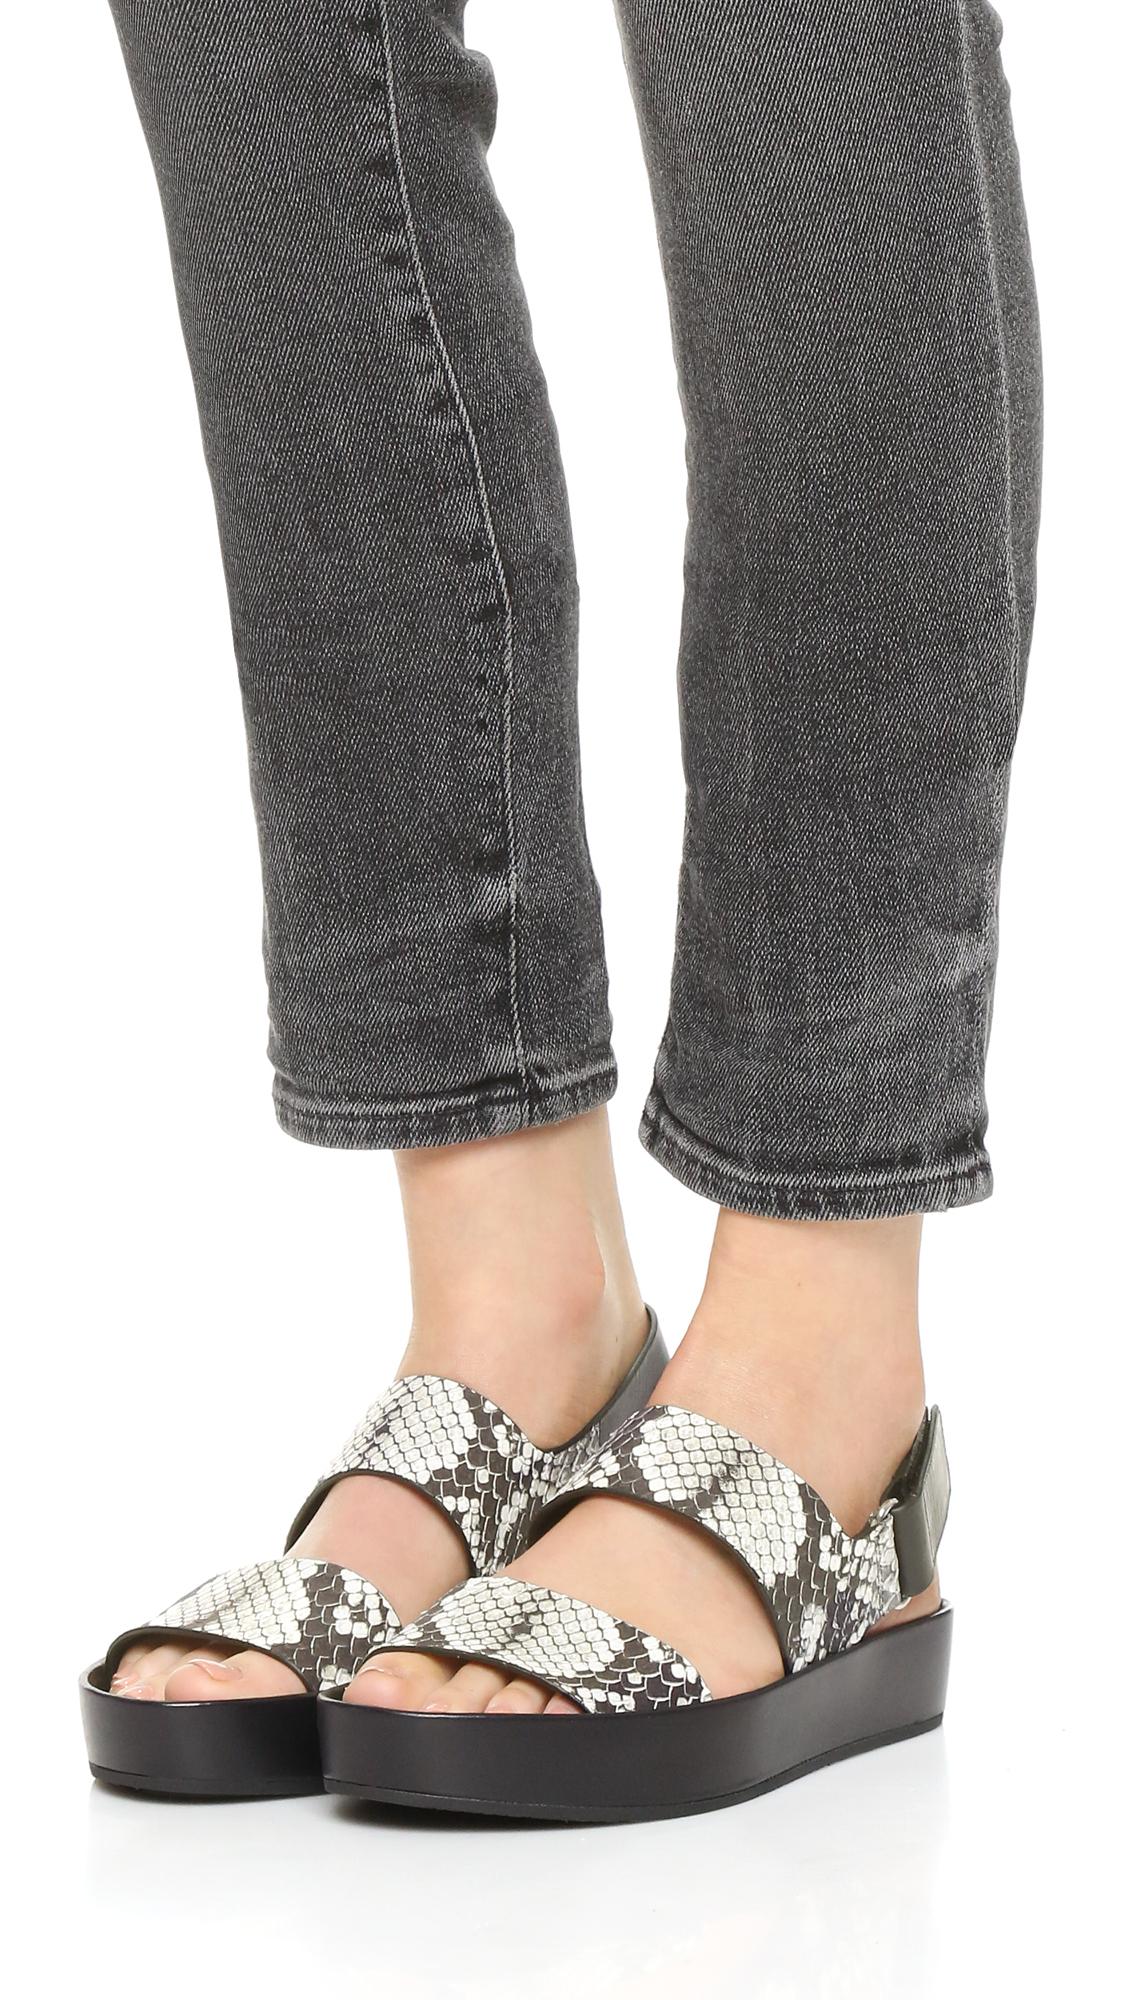 c25fcd73322 Lyst - Vince Marett Flatform Sandals in Black